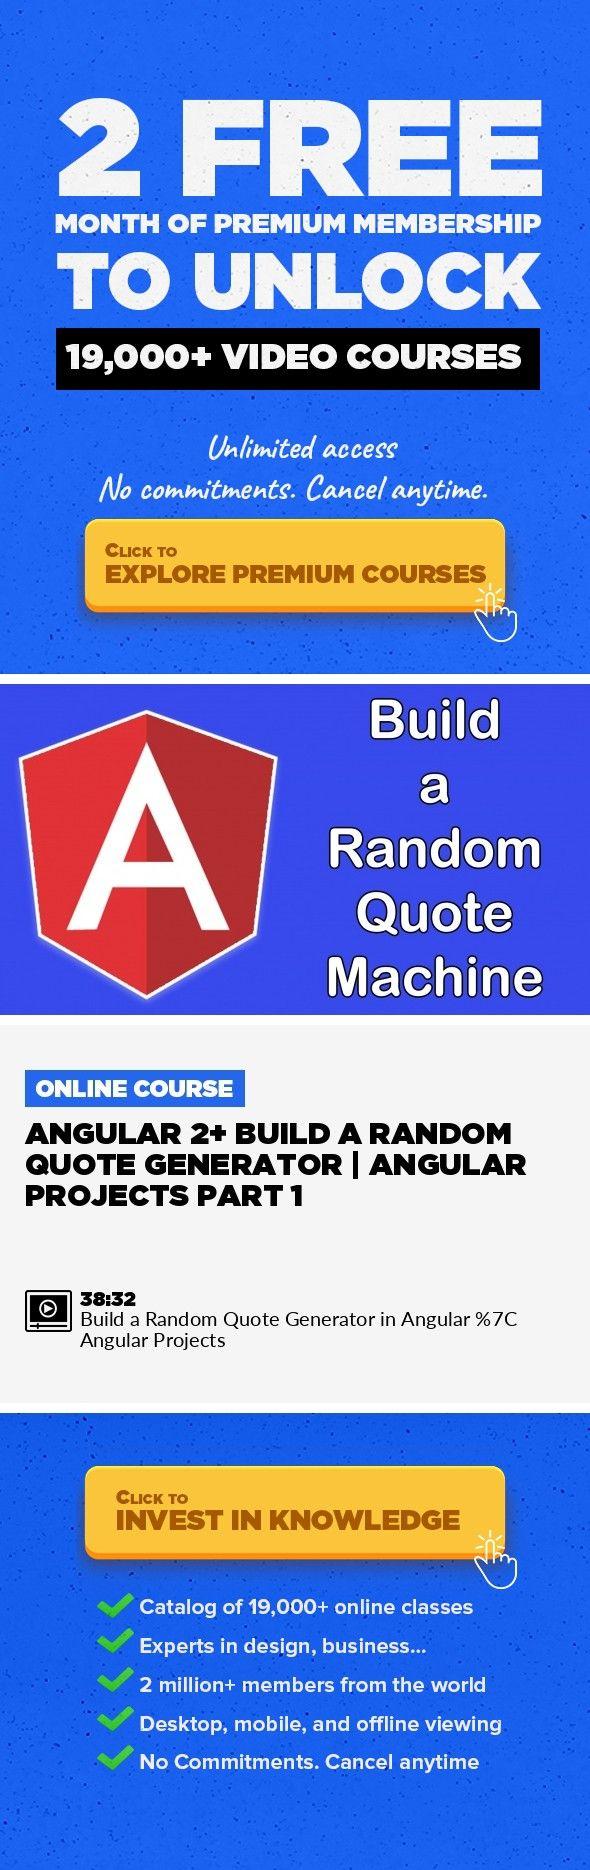 angular 2 build a random quote generator angular projects part 1